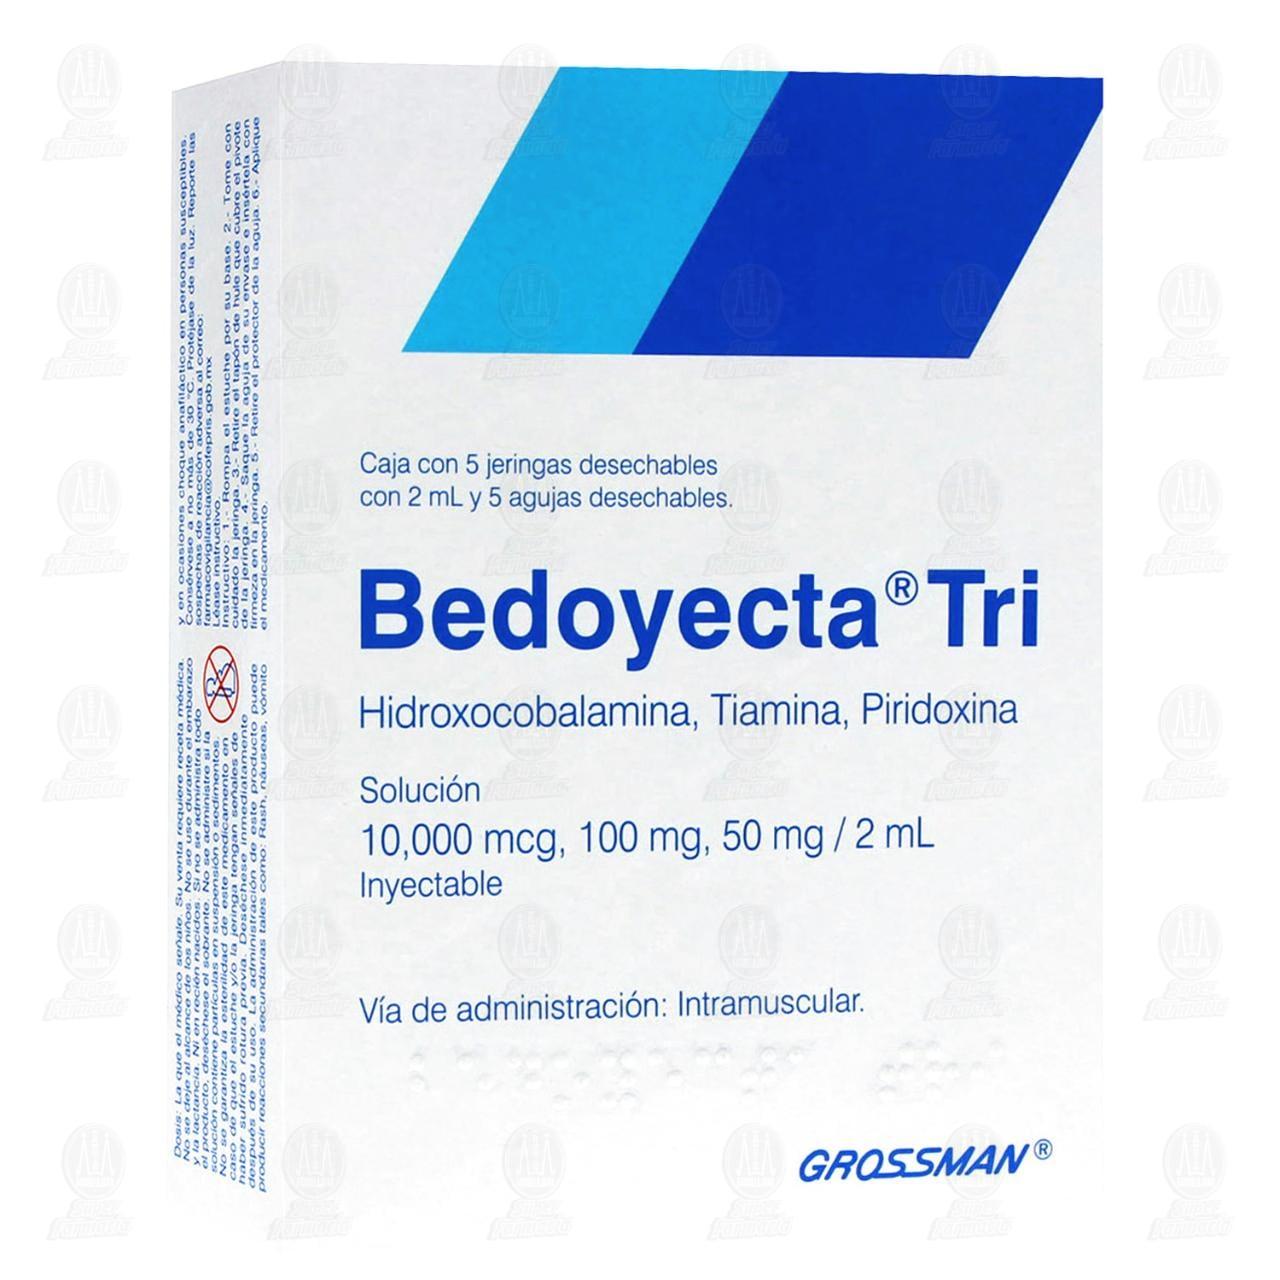 Bedoyecta Tri 50,000 2ml 5 Jeringas